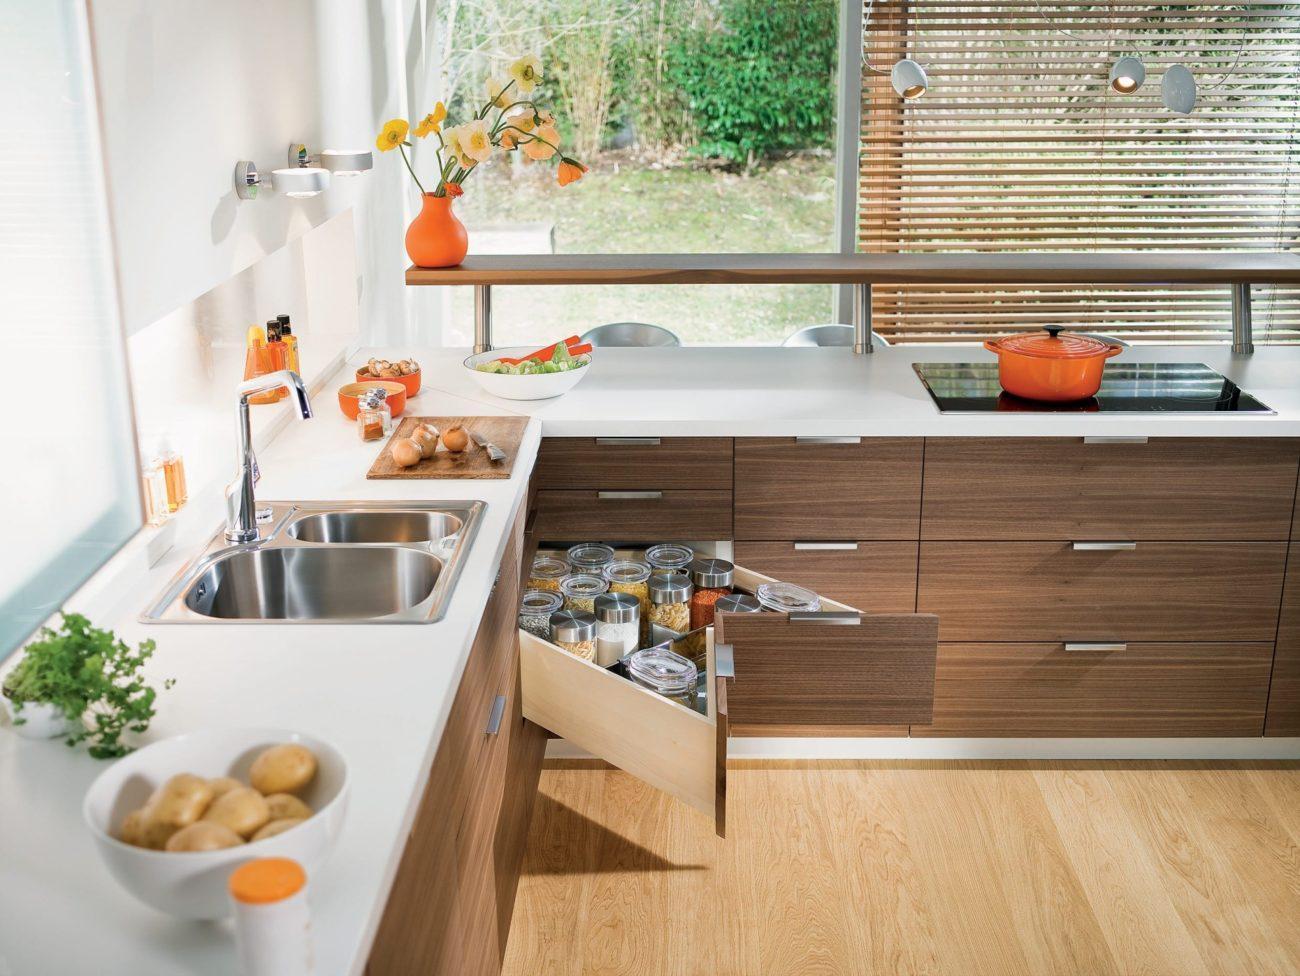 Ikea Küche Eckschrank Karussell